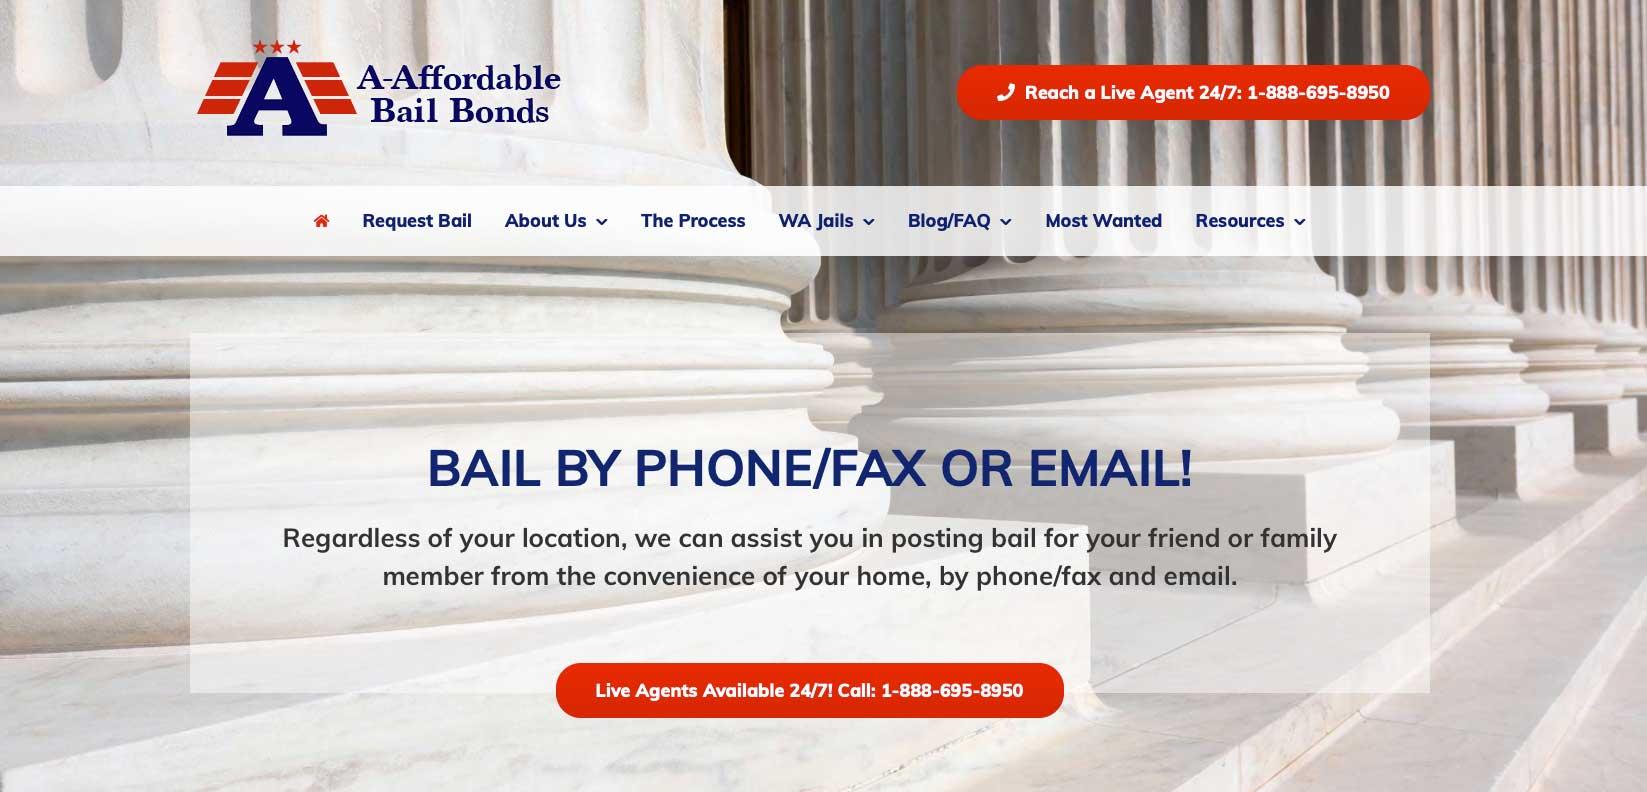 A-Affordable Bail Bonds logo